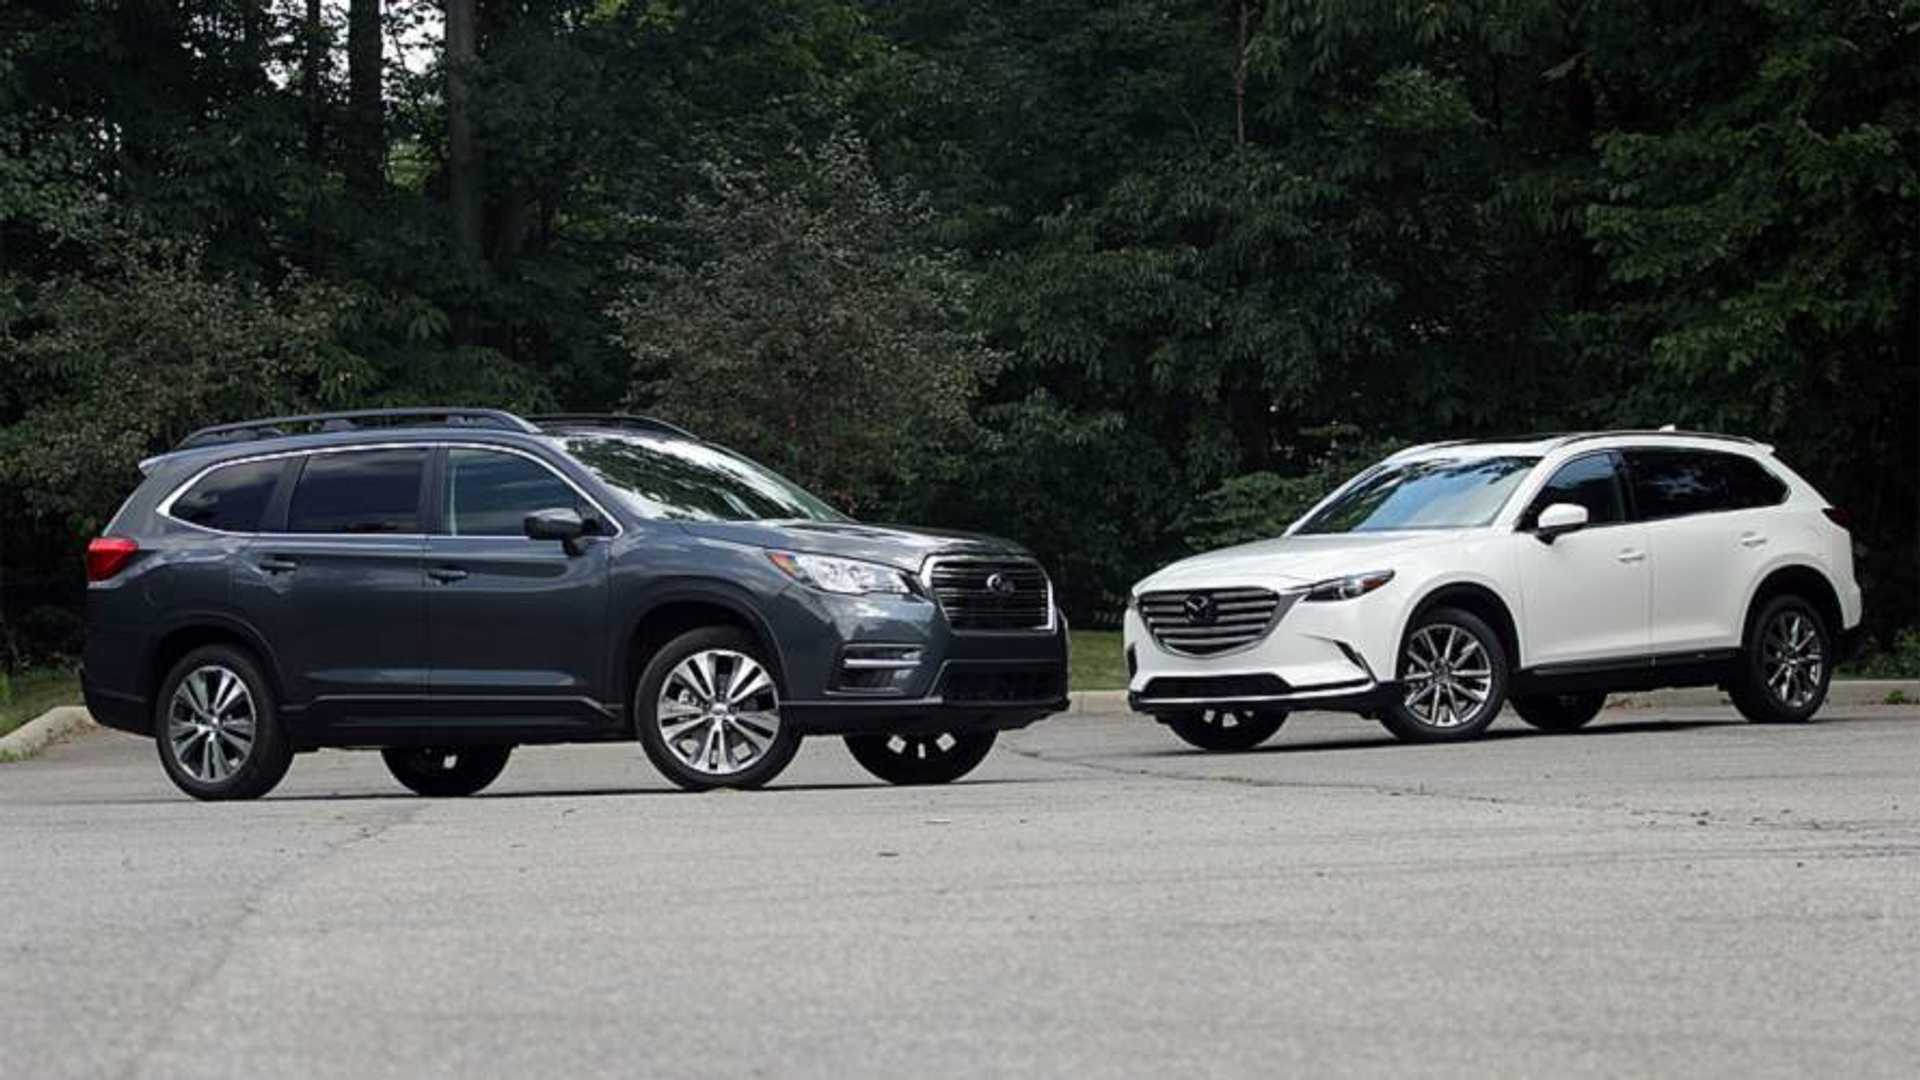 Subaru Ascent Vs  Mazda CX-9: Substance, Meet Style